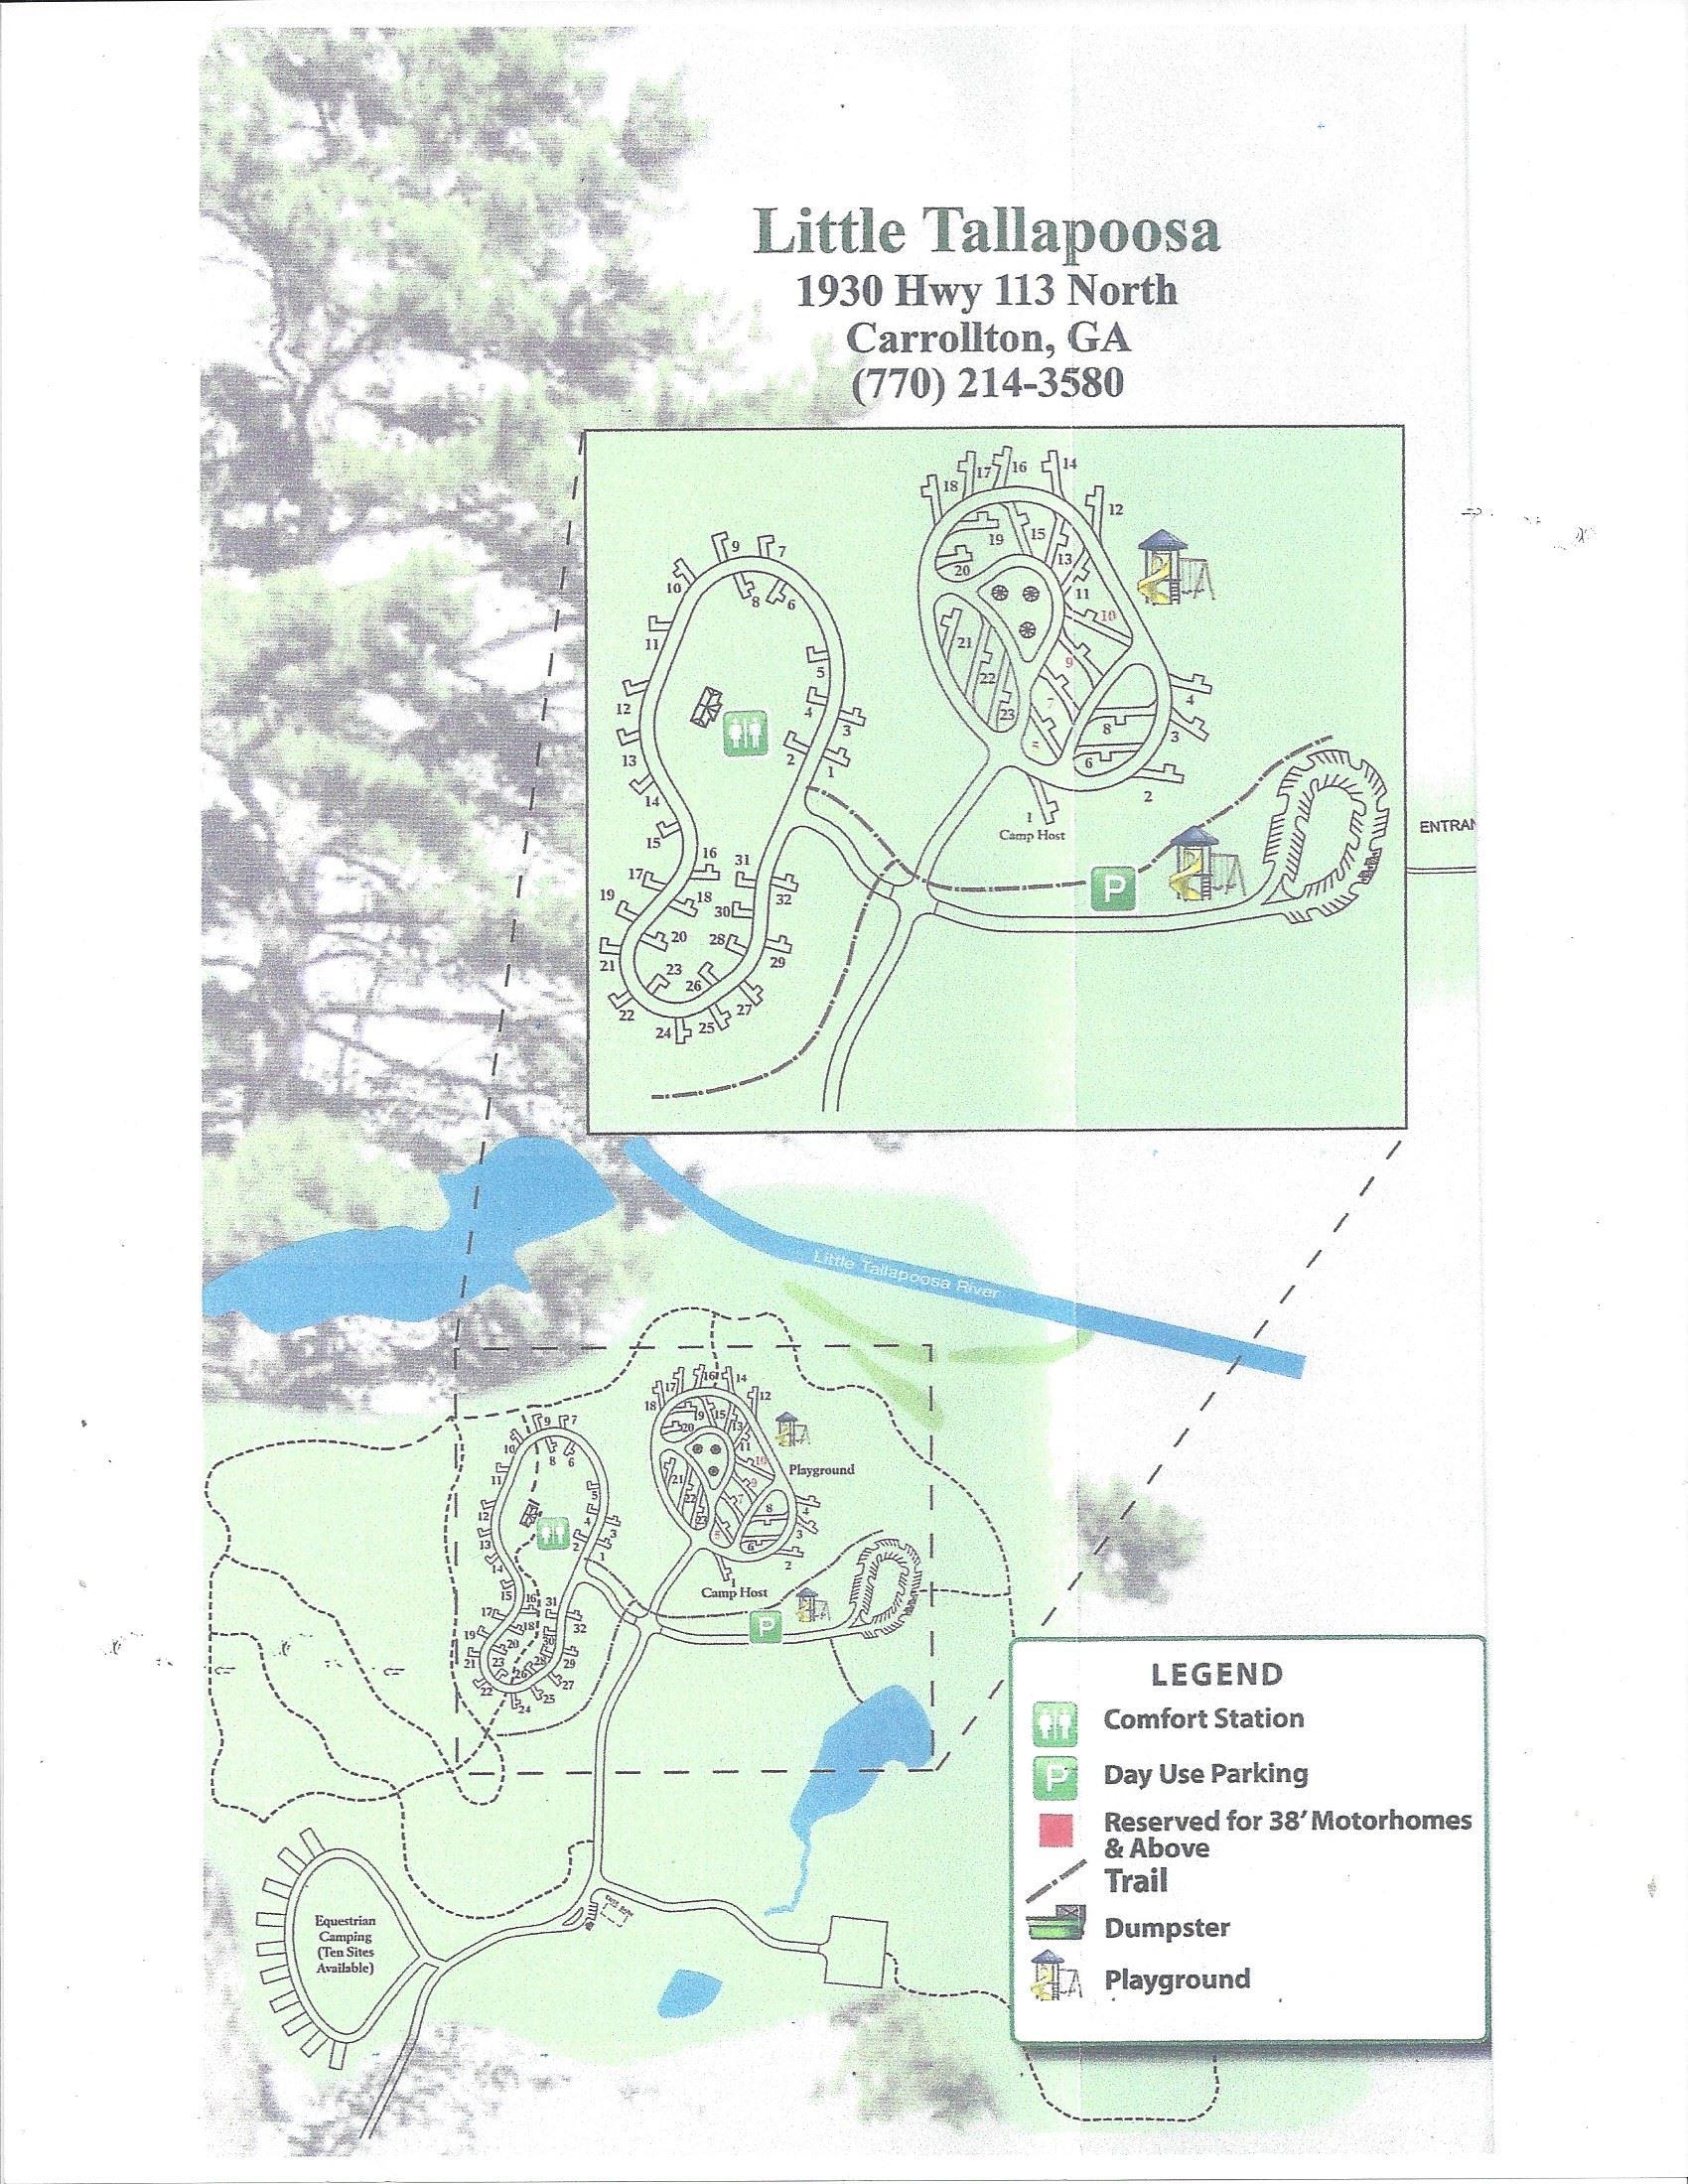 Little Tallapoosa Park | Carroll County, GA - Official Website